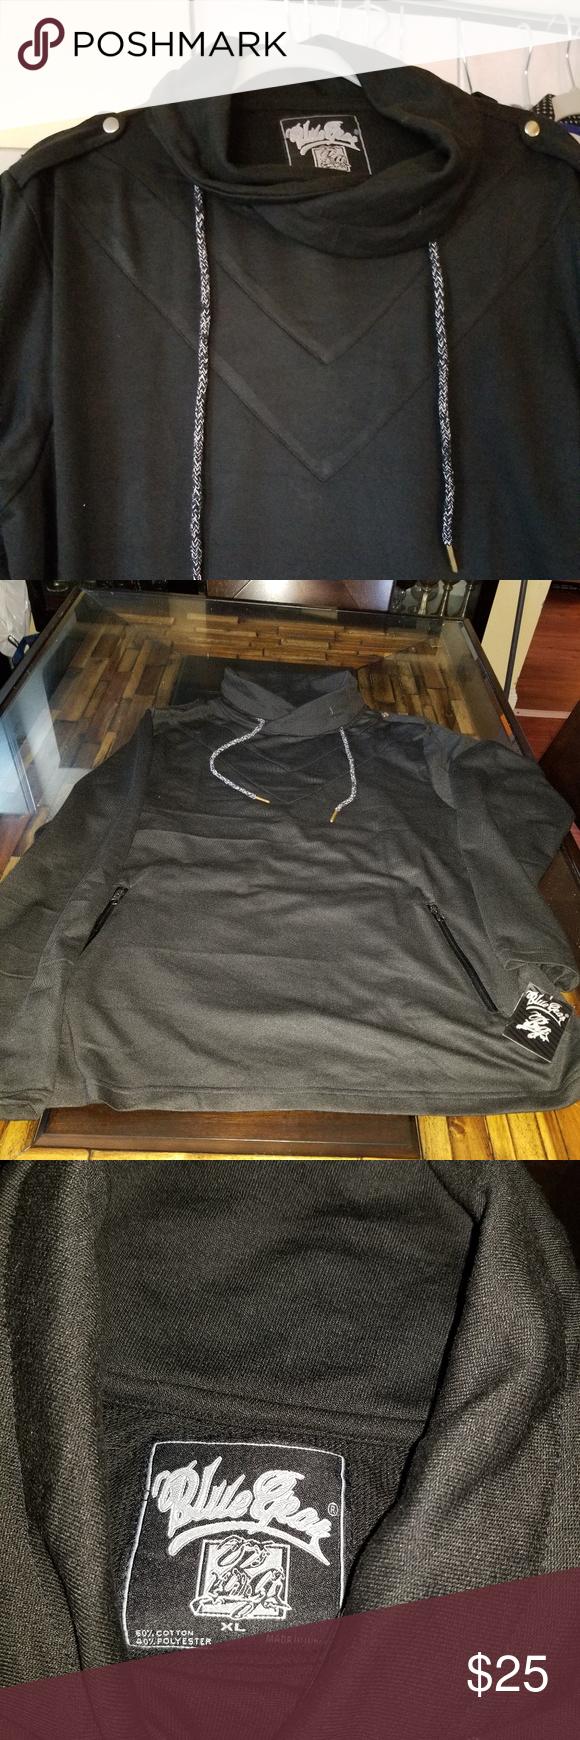 Brand New Light weight sweat shirt This Trend setting